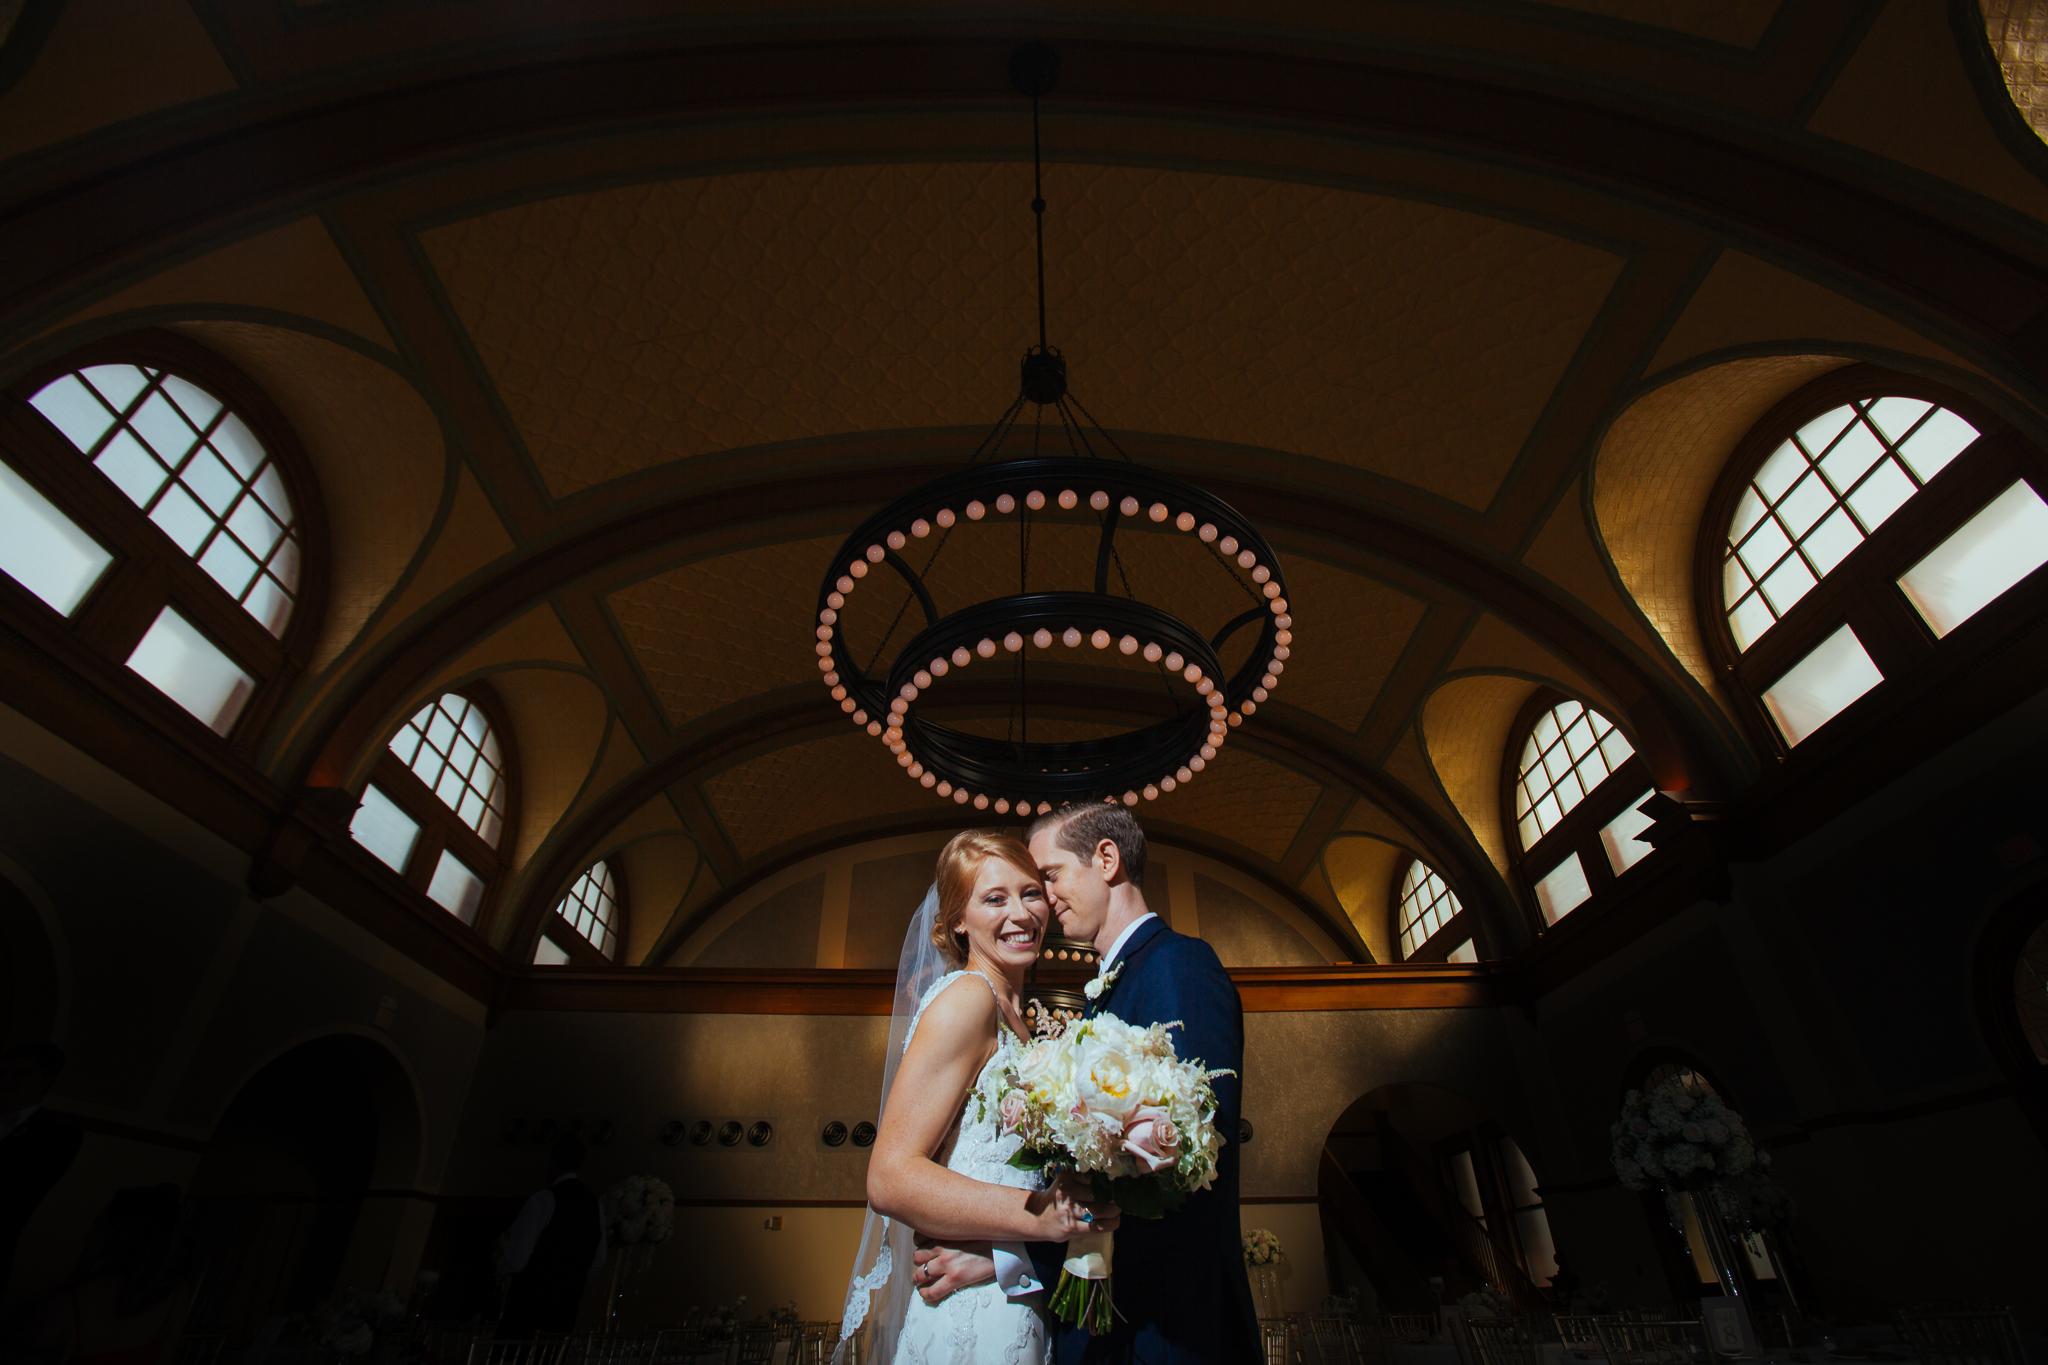 Michael and Kelly - the ashton depot - wedding DFW - wedding photographer- elizalde photography (68 of 150).jpg